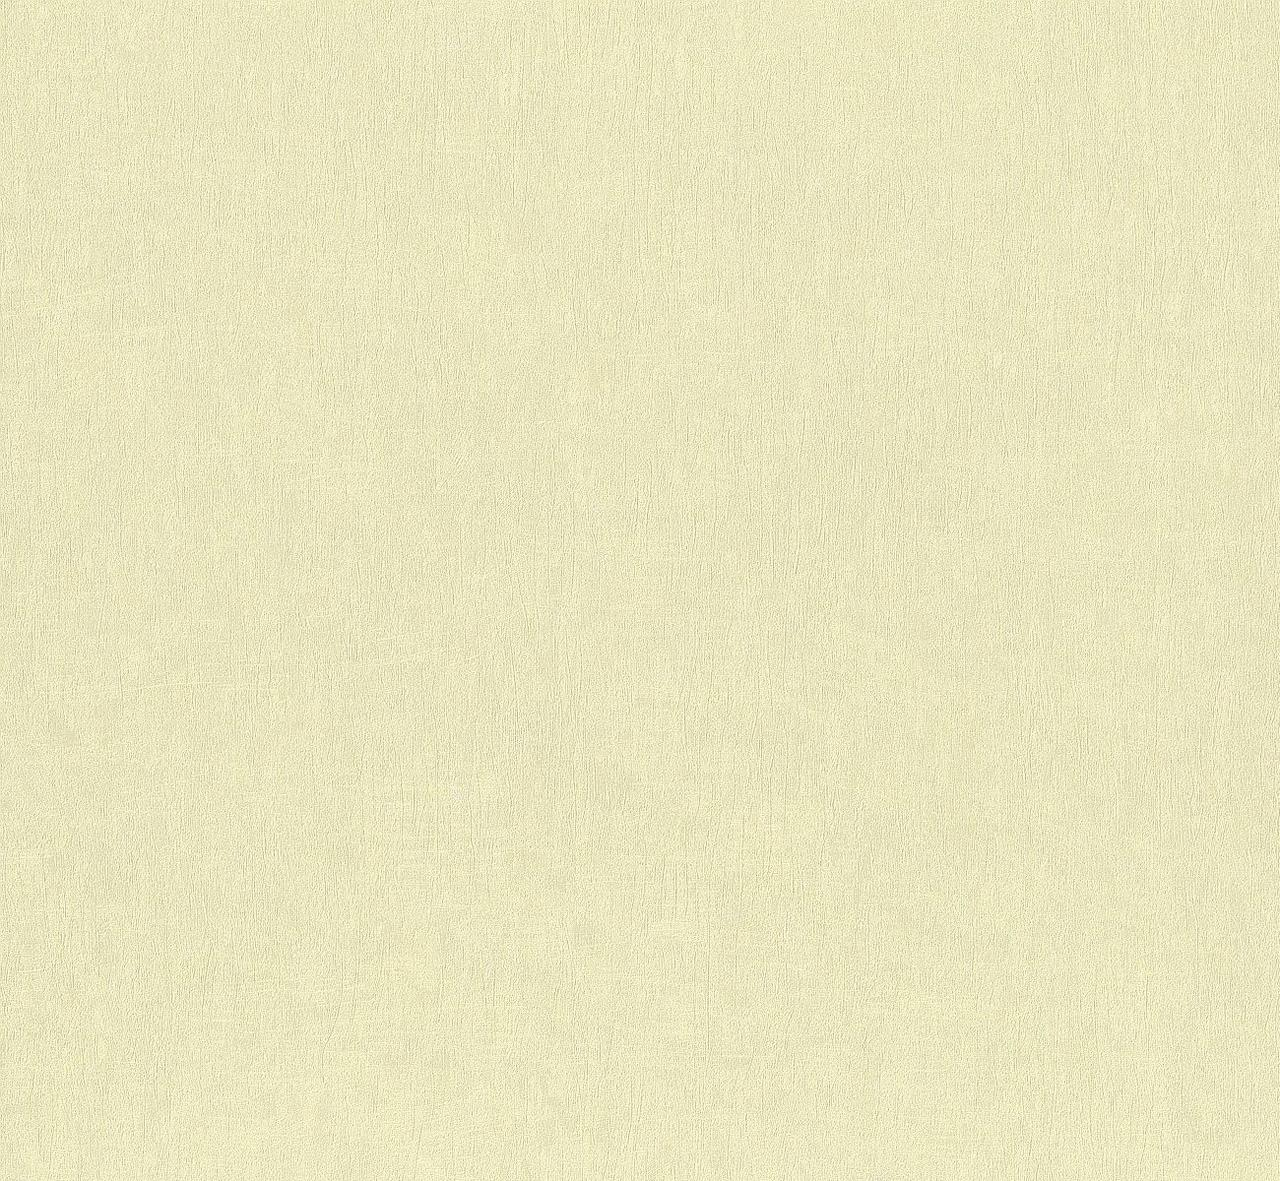 Флизелиновые обои MARBURG OPULENCE 77850 Бежевые